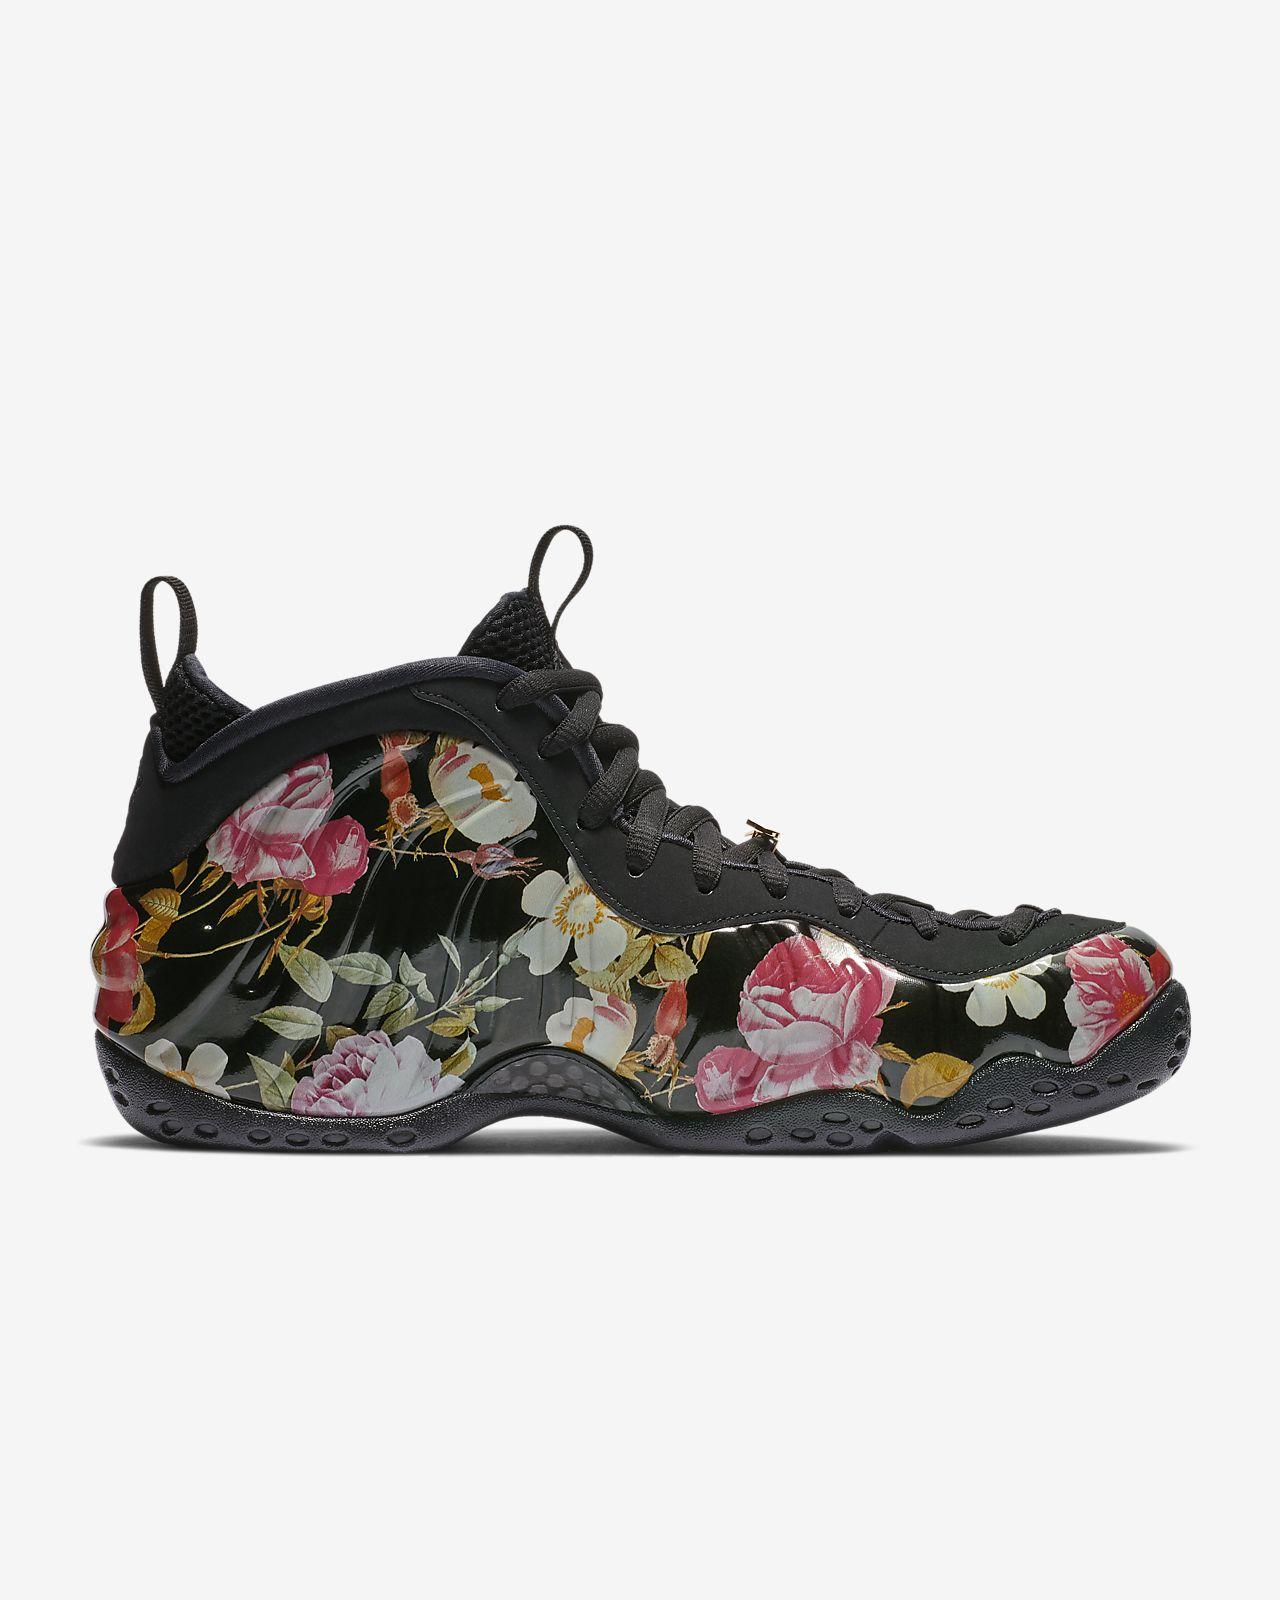 cheaper 94bca 48013 ... Nike Air Foamposite One Men s Shoe